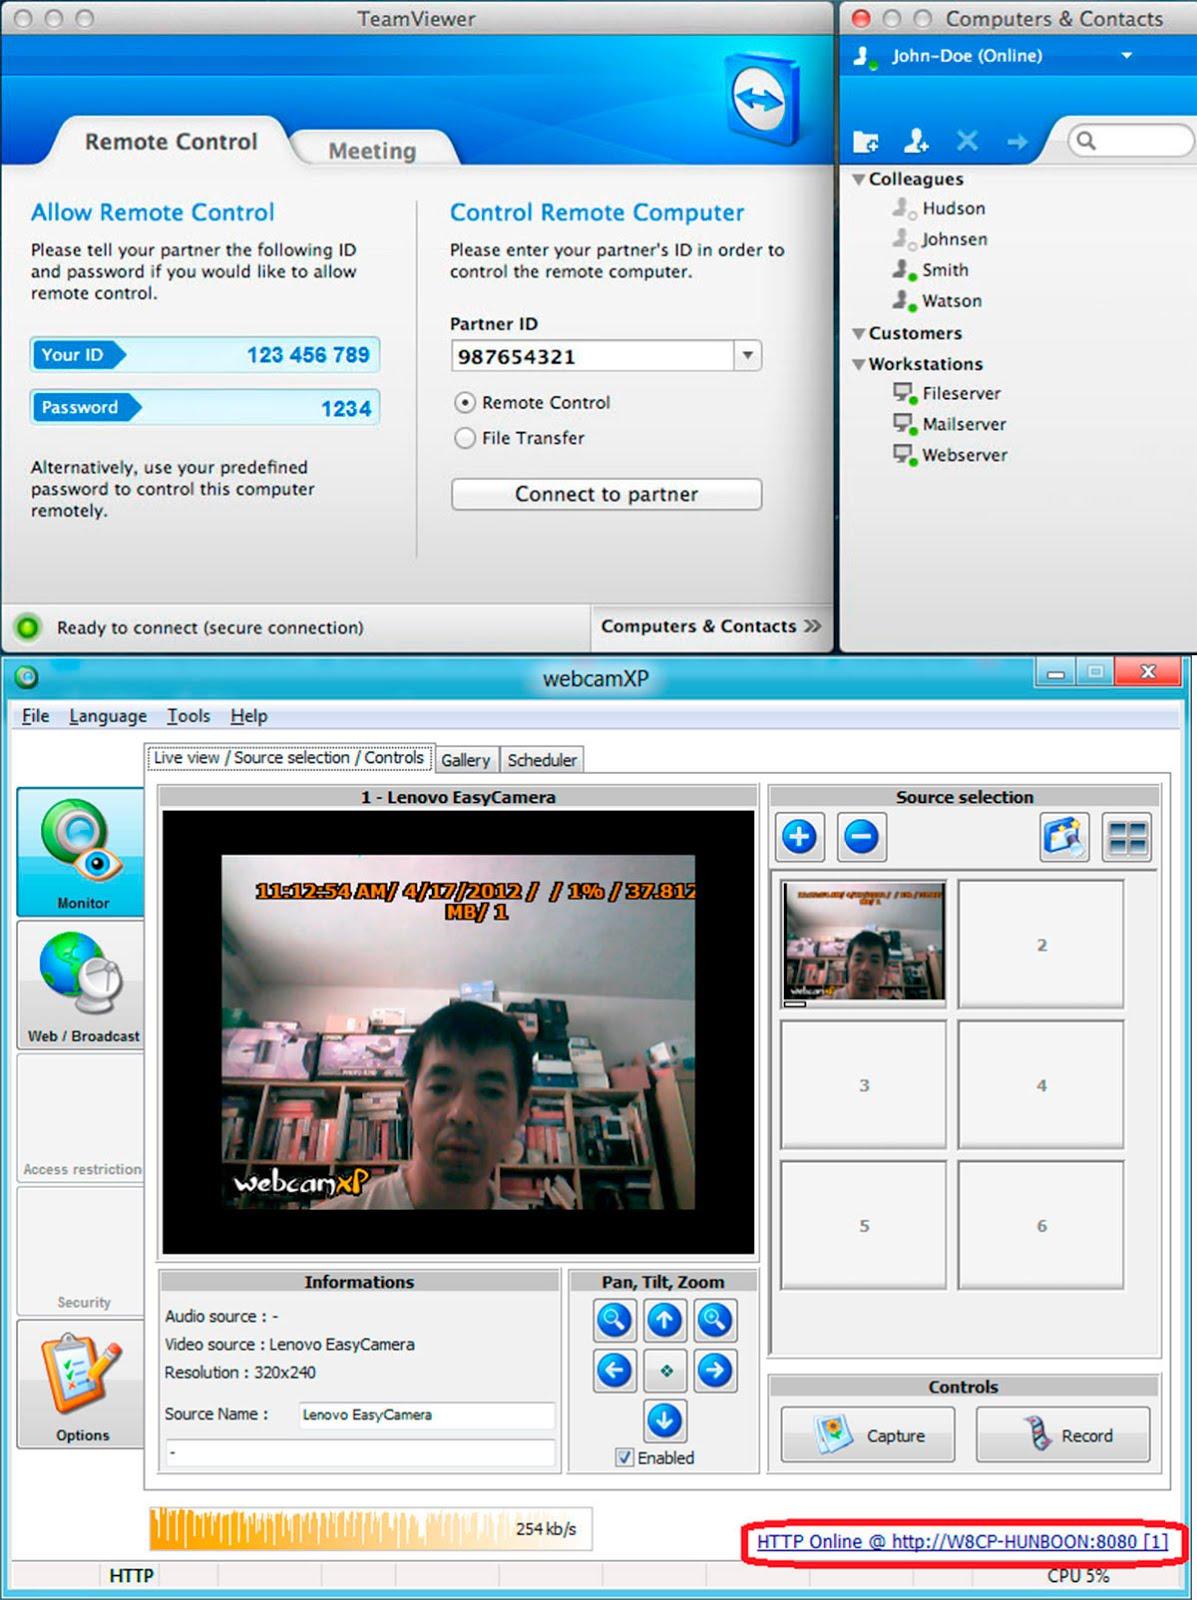 teamviewer7-mac-mountain-lion-ena.jpg